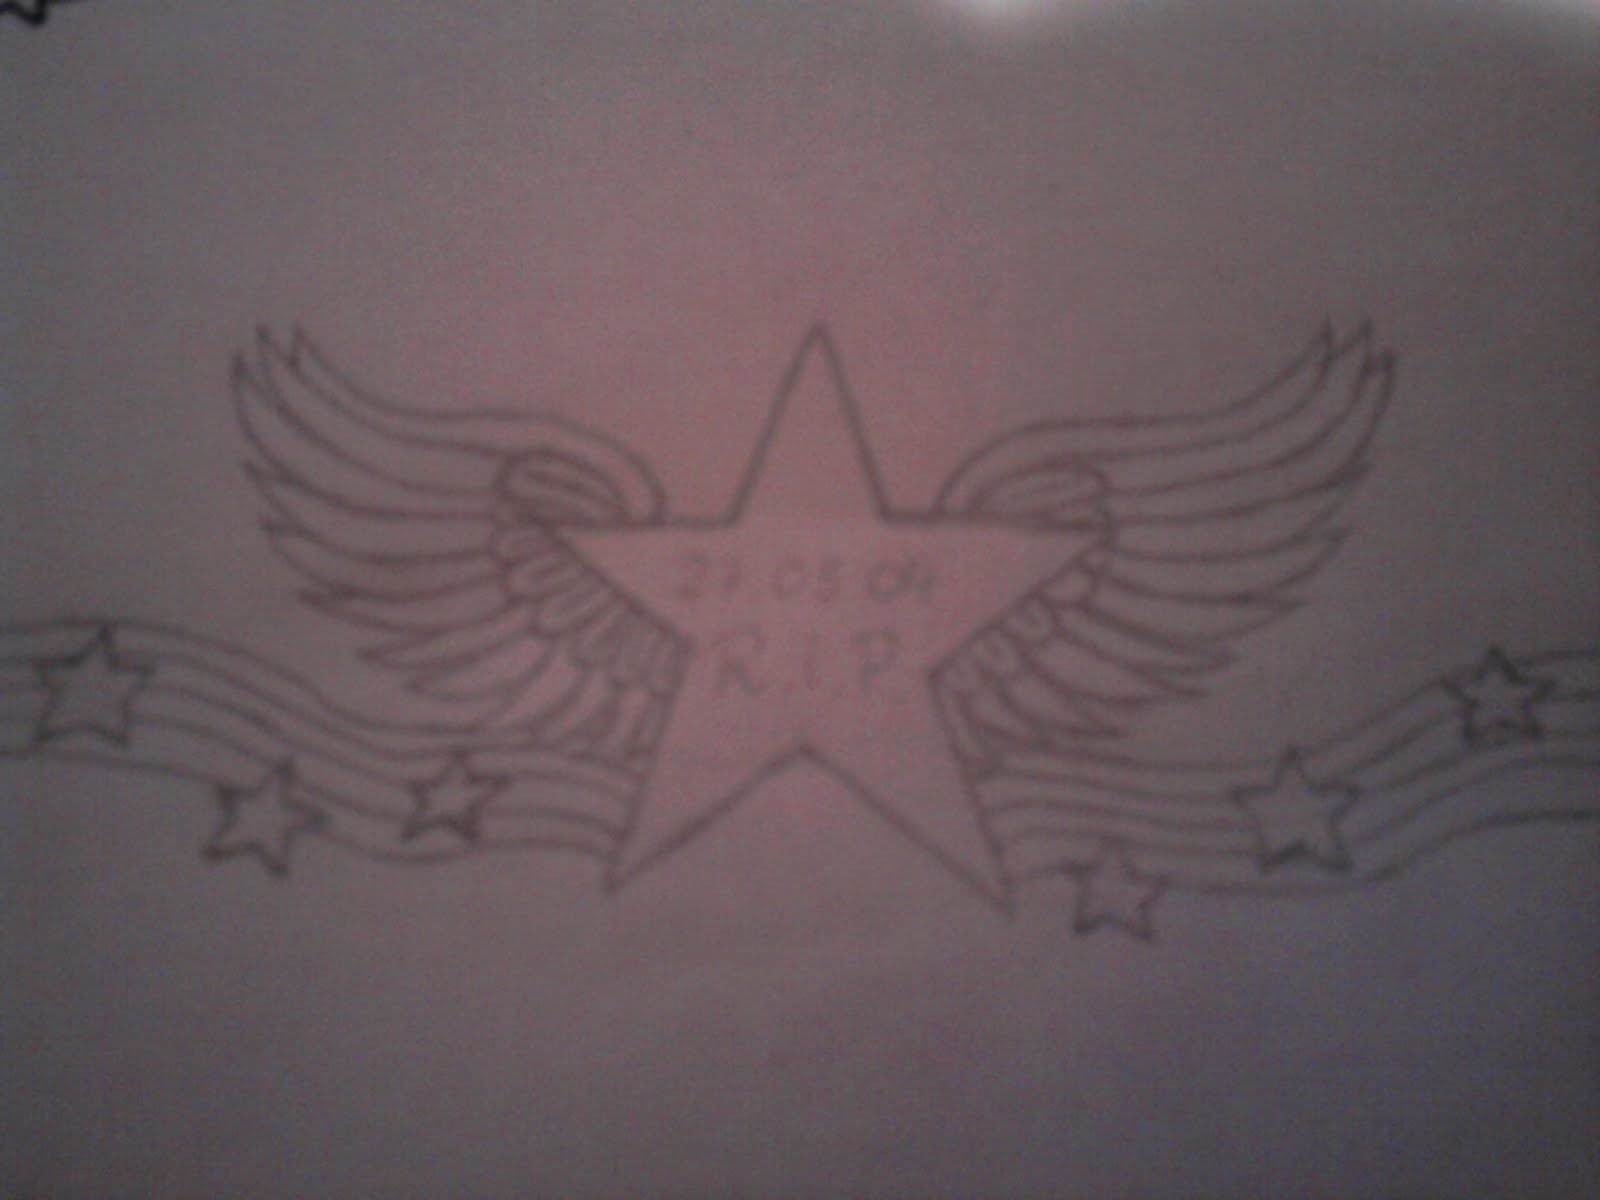 Tattoo Sternenschweif Pjess Sternenschweif 2019 09 30